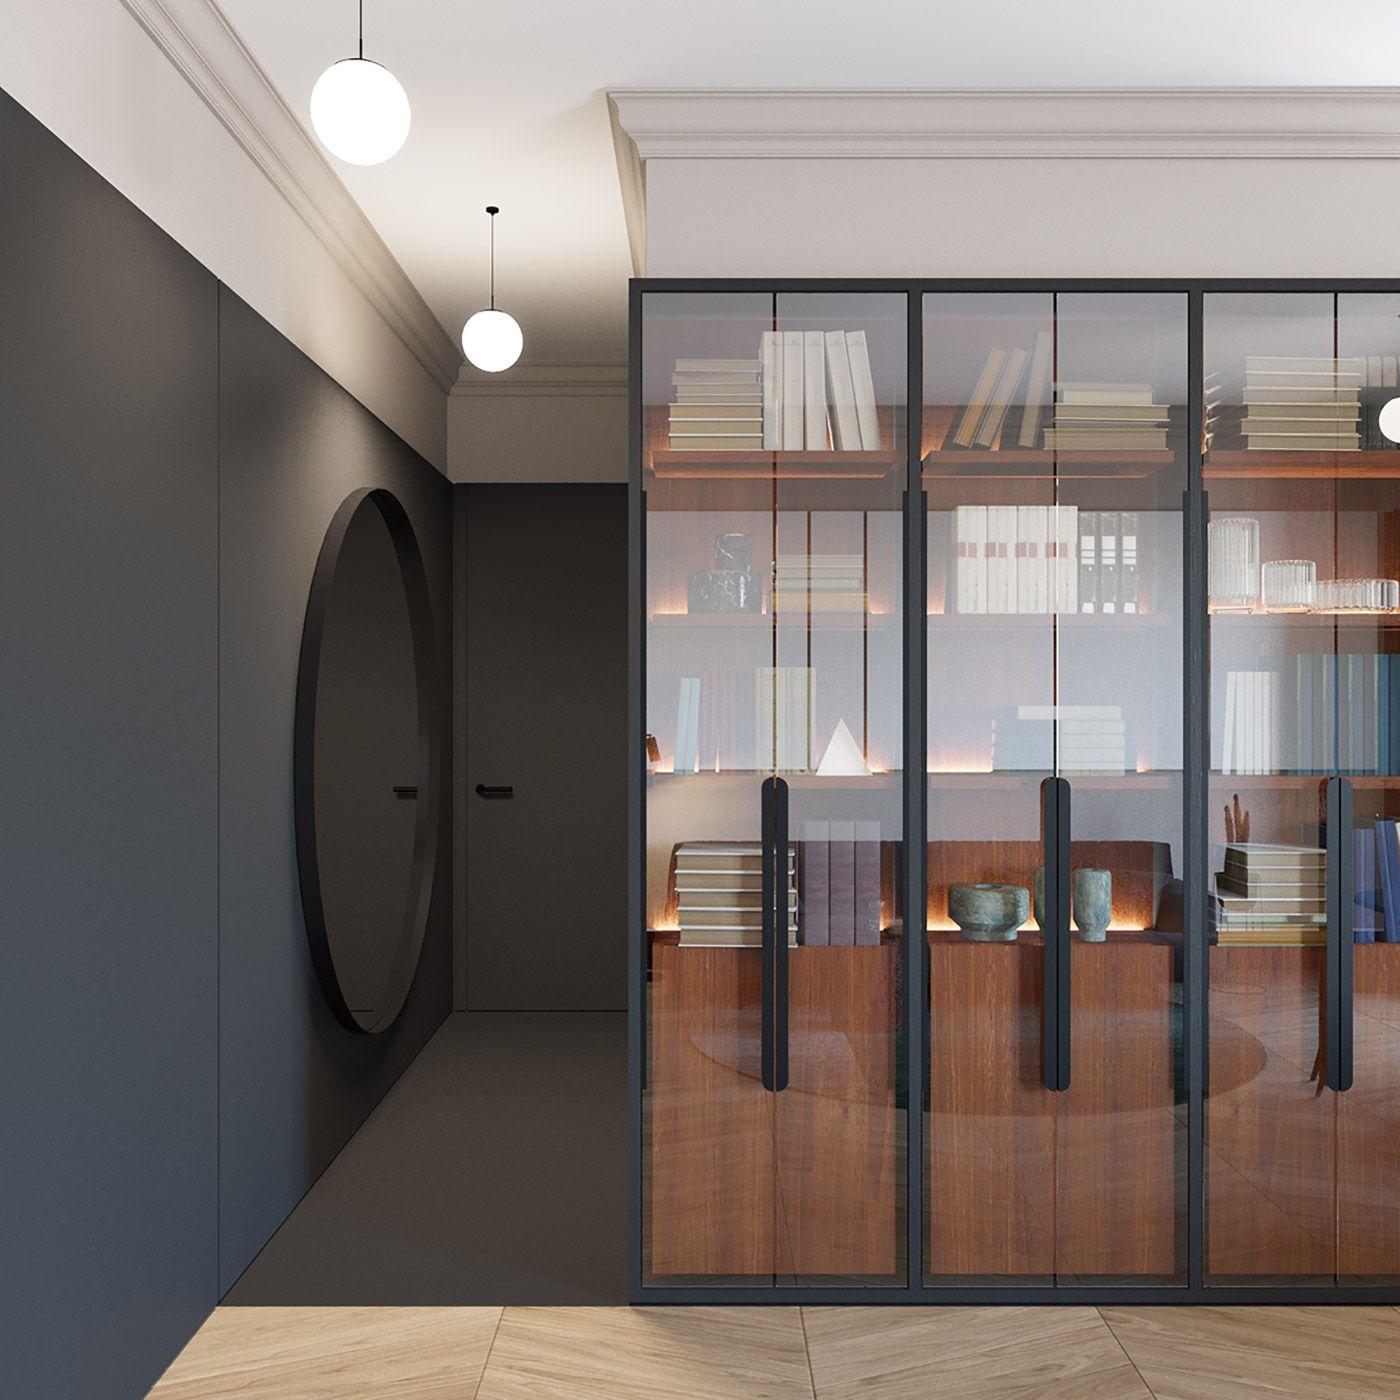 55 Sq Meters Apartment – Mindsparkle Mag